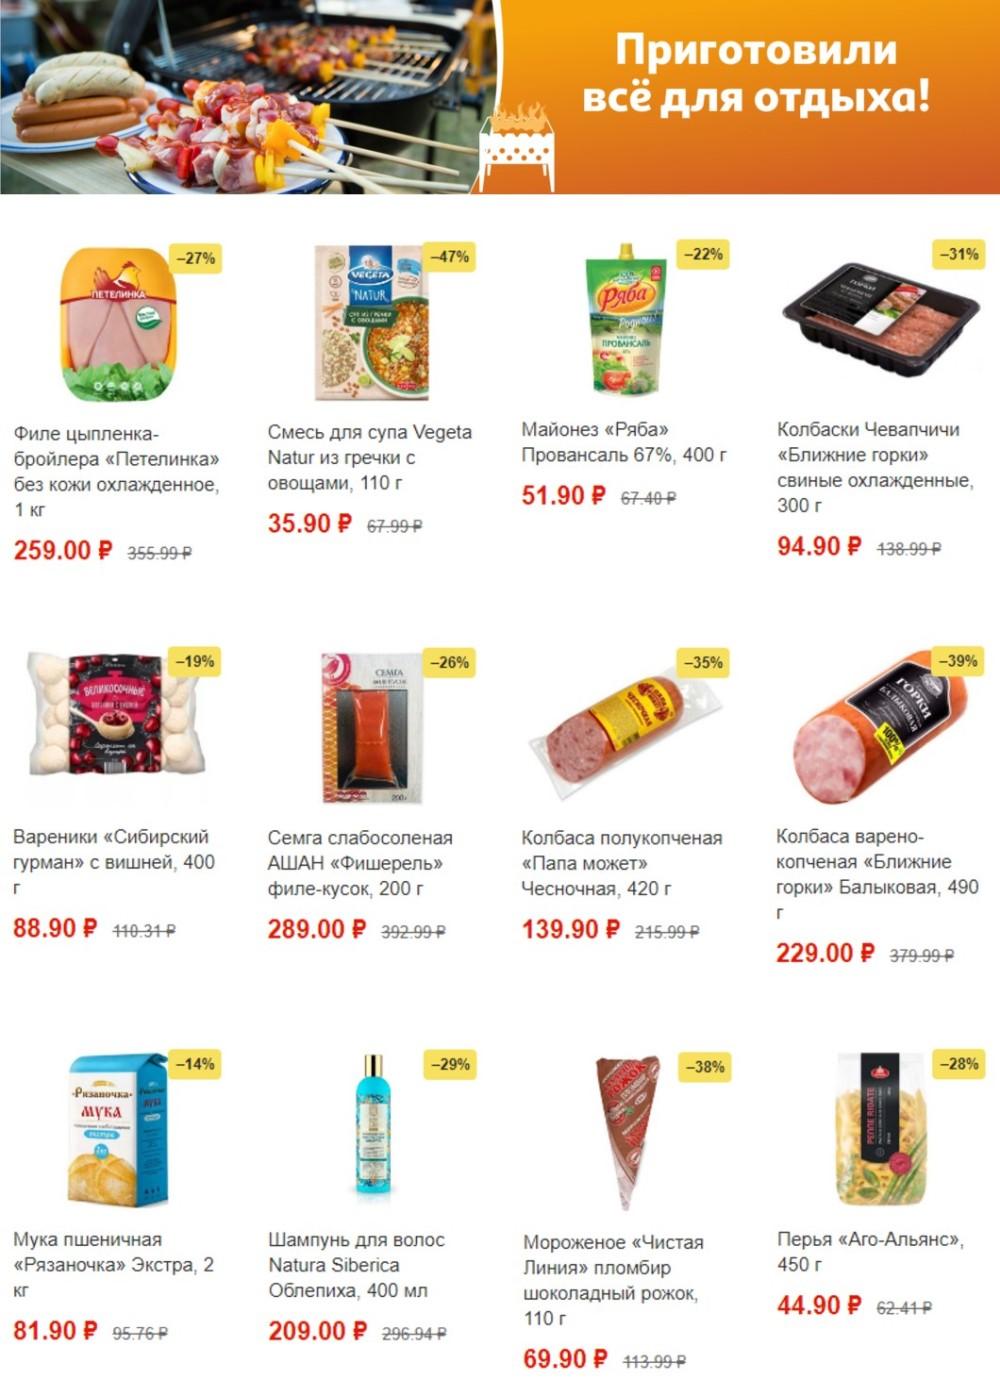 Новый каталог акций в Ашан Сити г. Москва